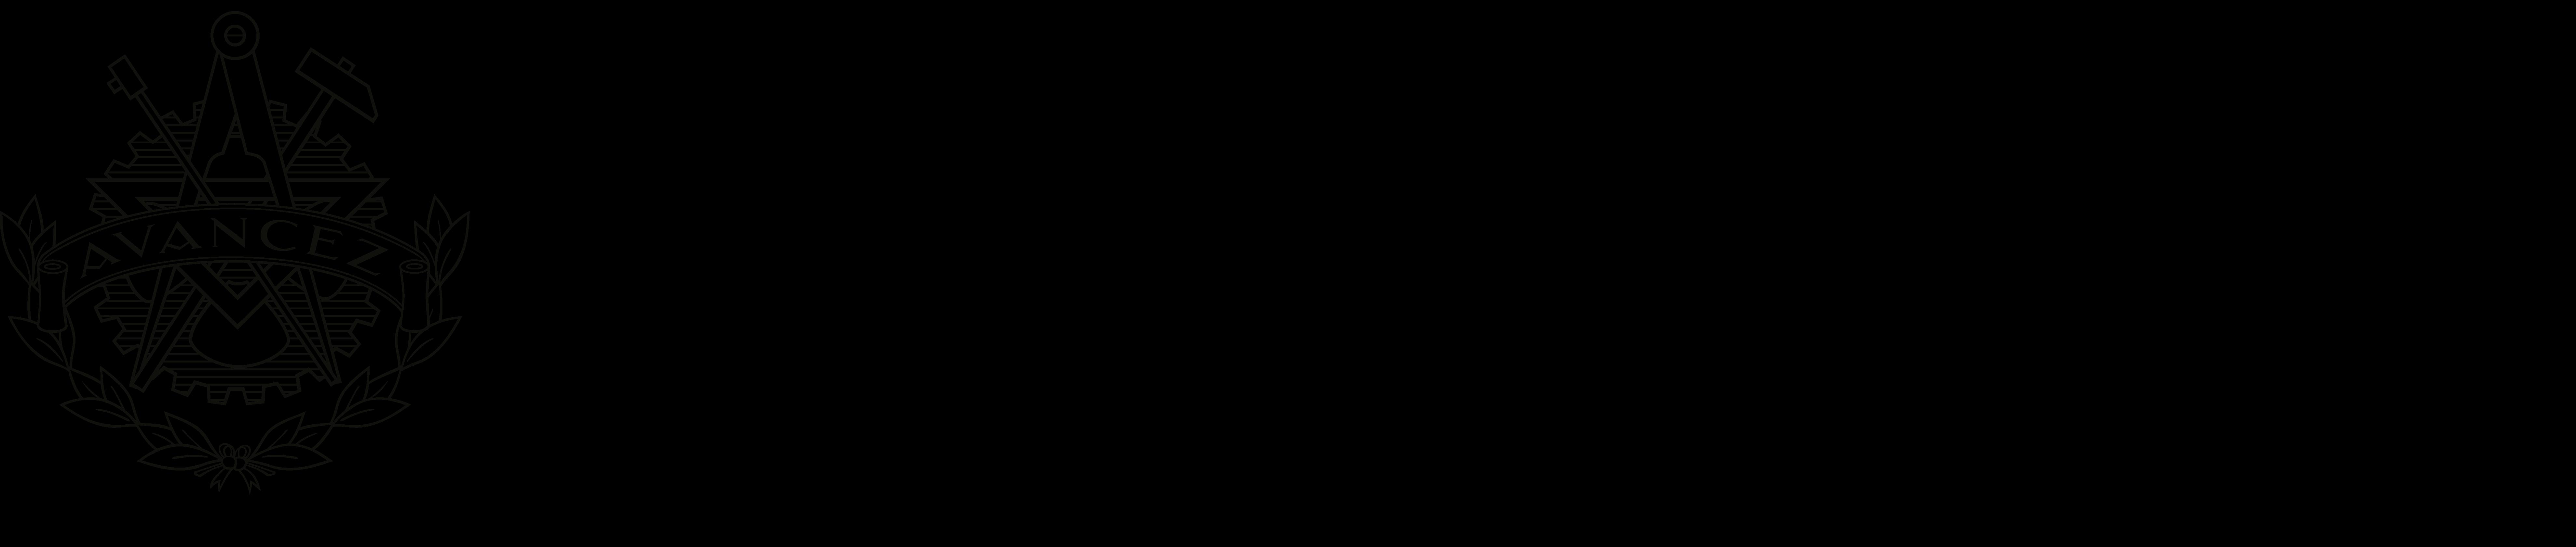 chalmers_konferens_logo_sigill_vanster